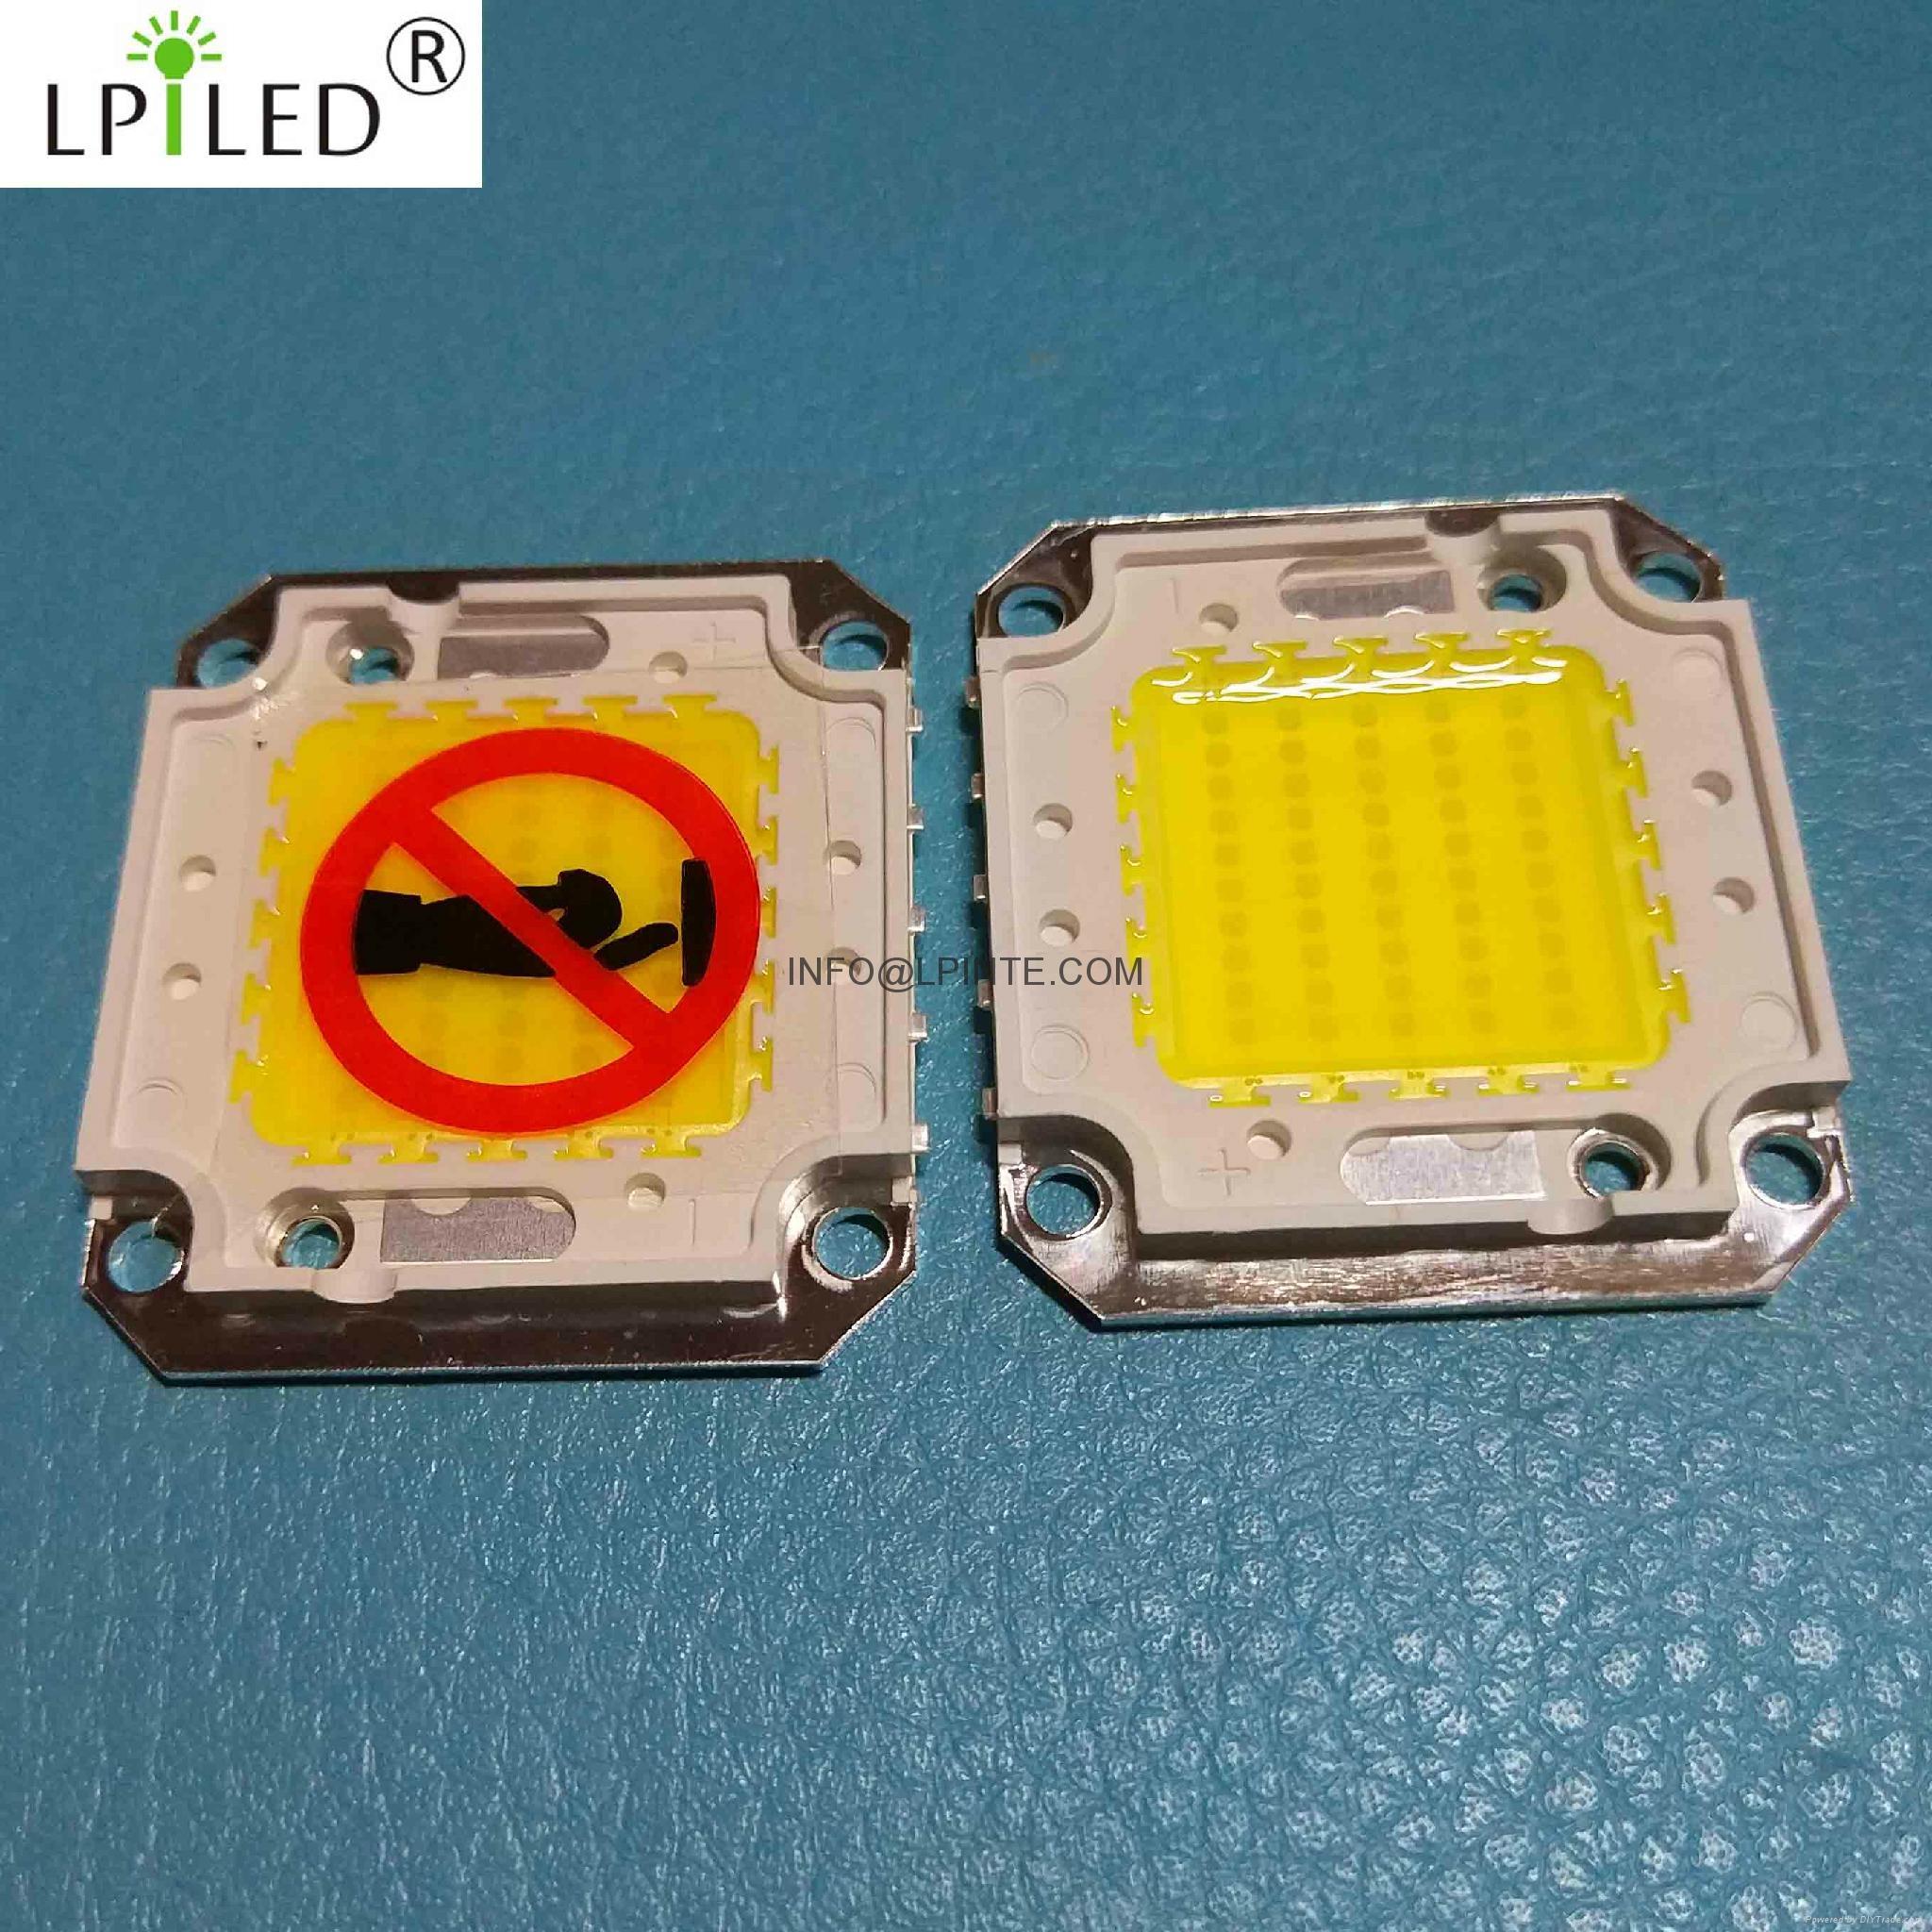 50w LED RGBW CHIP LED RGBW COB LED RGB LED MODULE WW CW RGBY 1